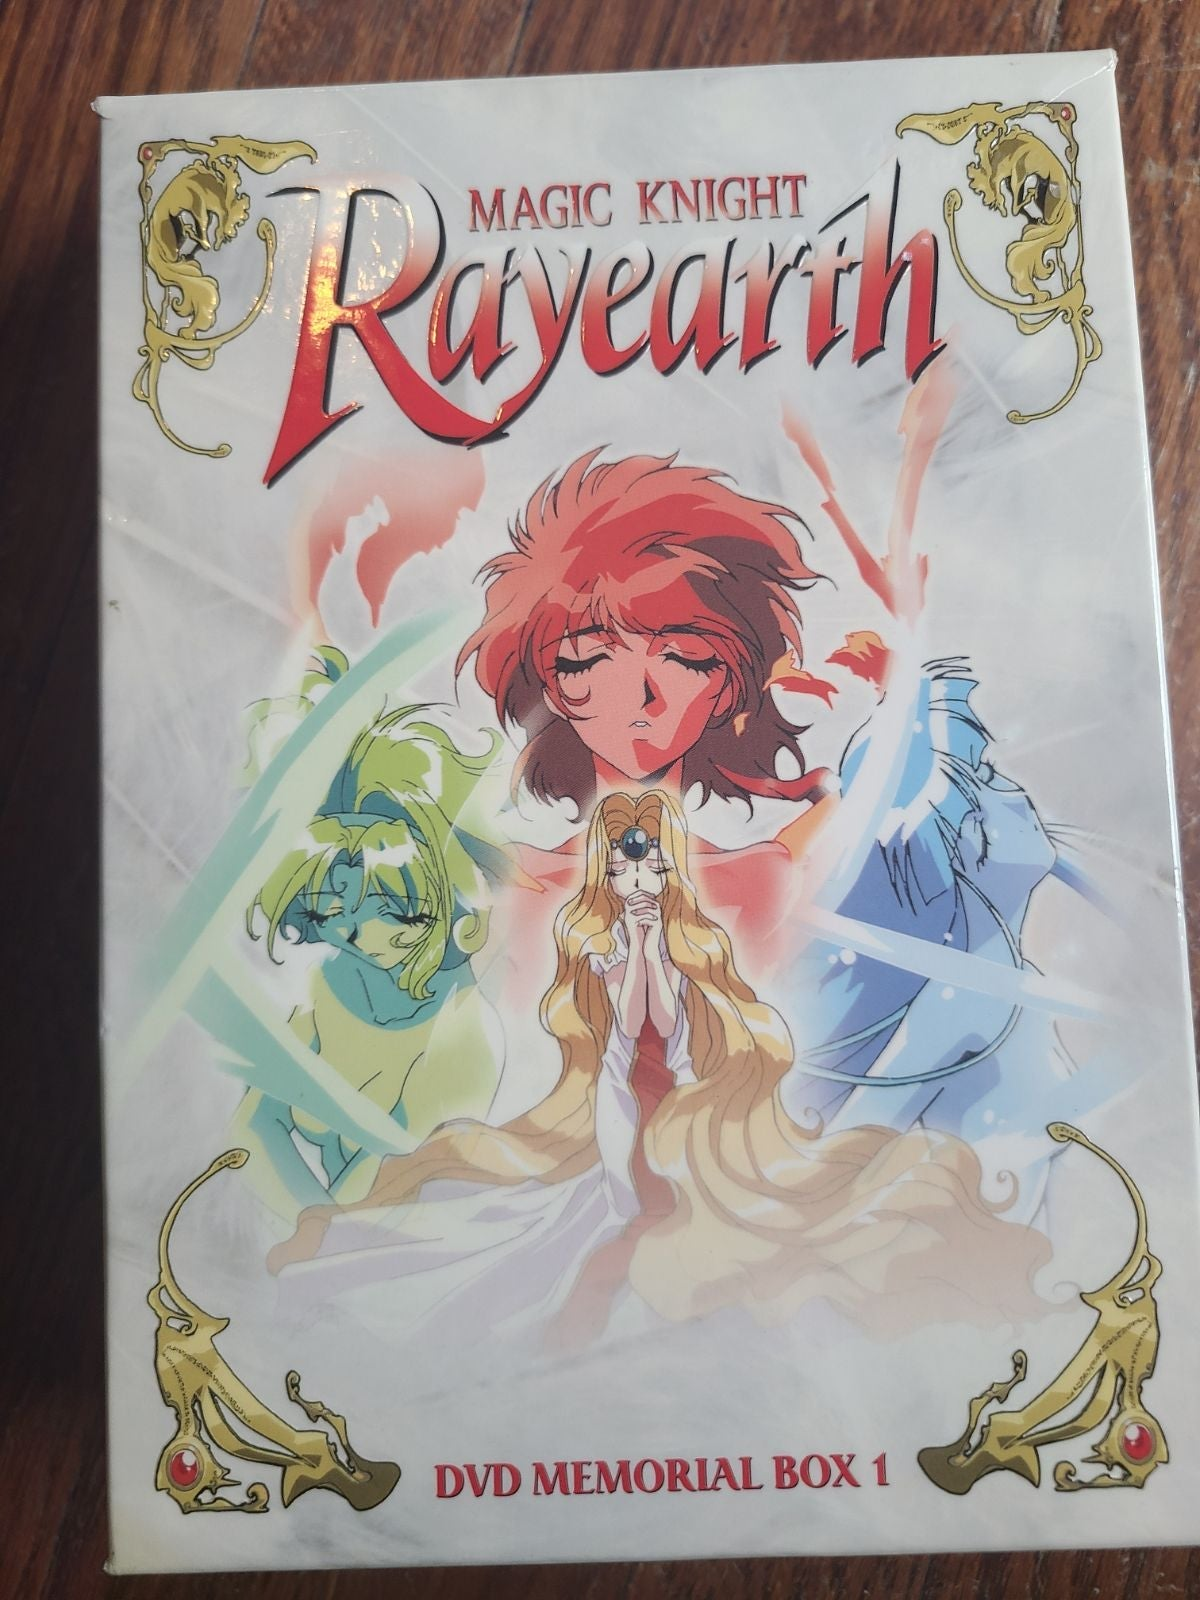 Magic Knight Rayearth DVD Box 1